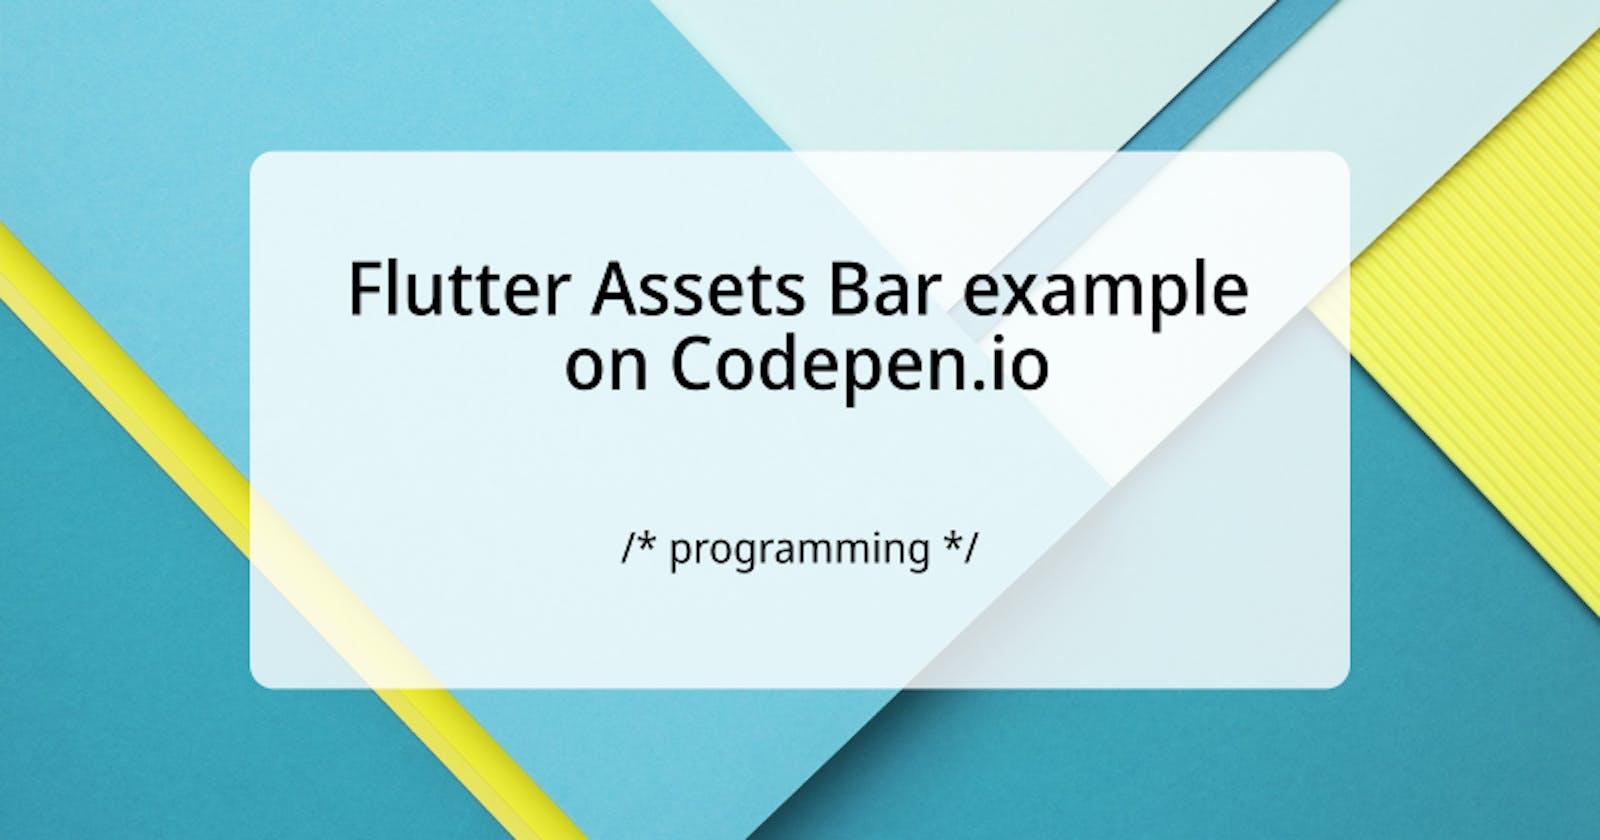 Flutter Assets Bar example on Codepen.io, let's codeit!